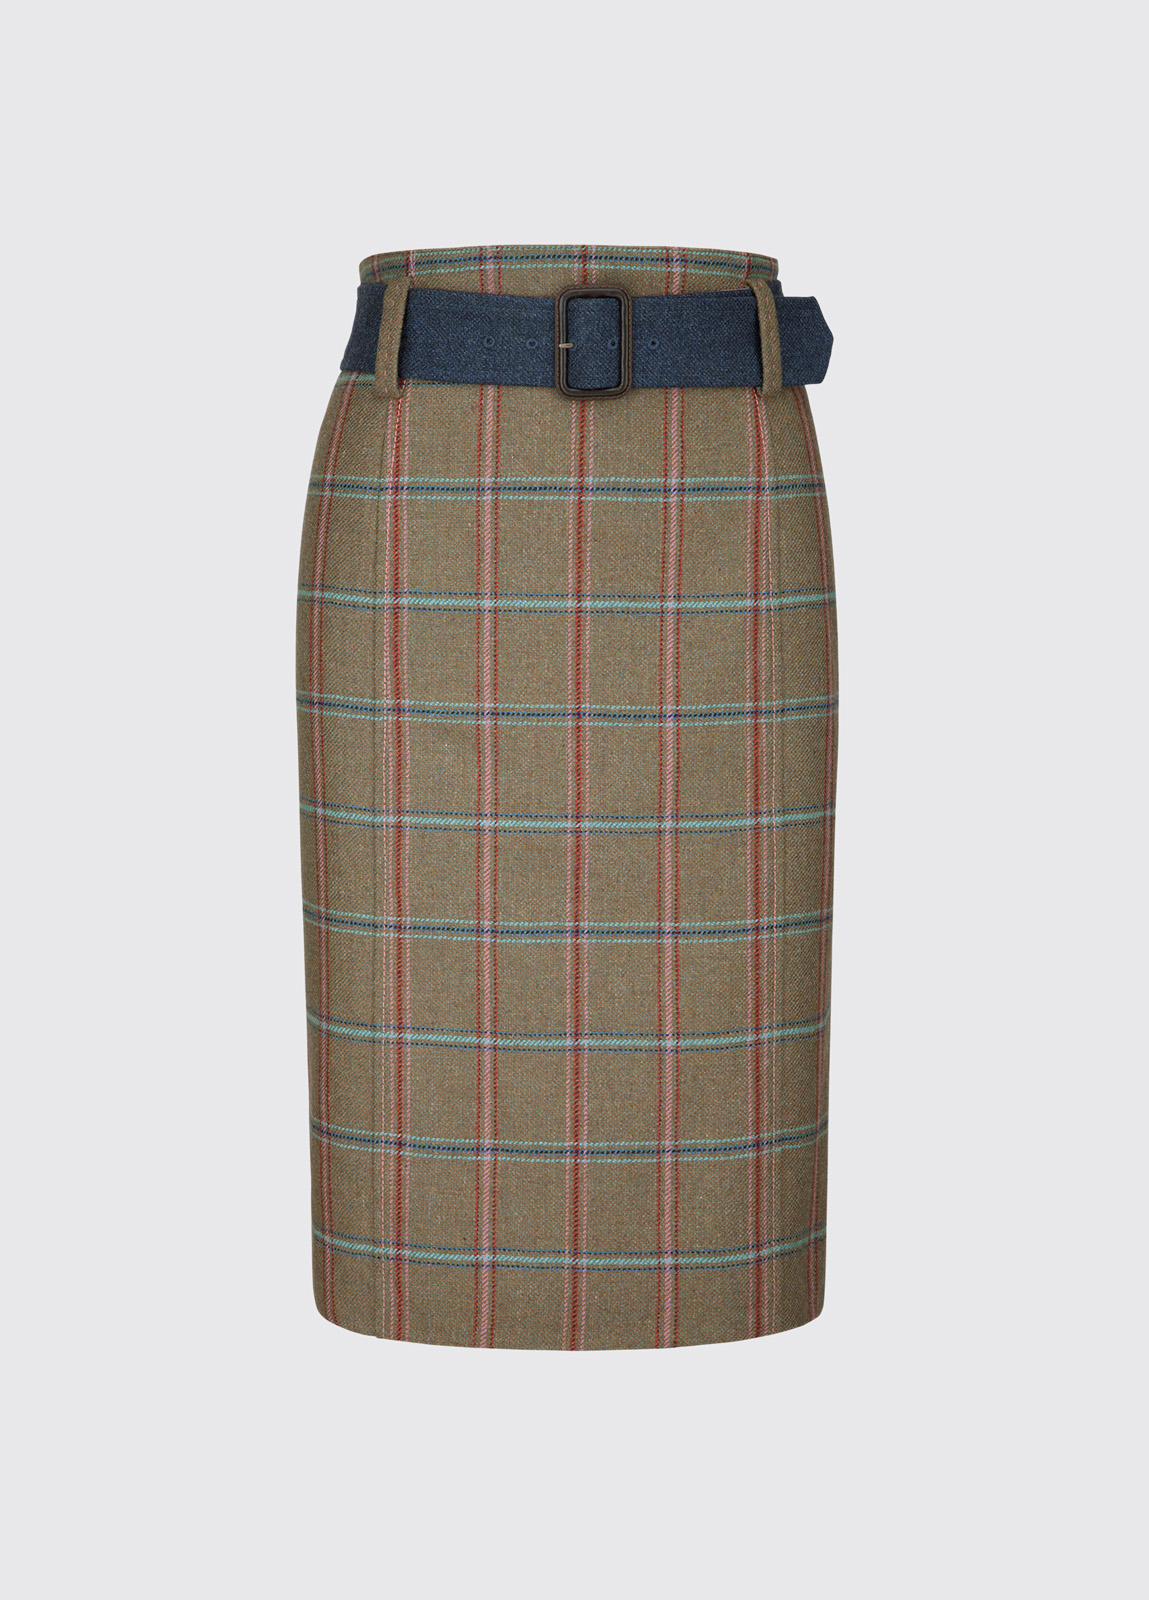 Arrowgrass Knee Length Tweed Skirt - Connacht Meadow